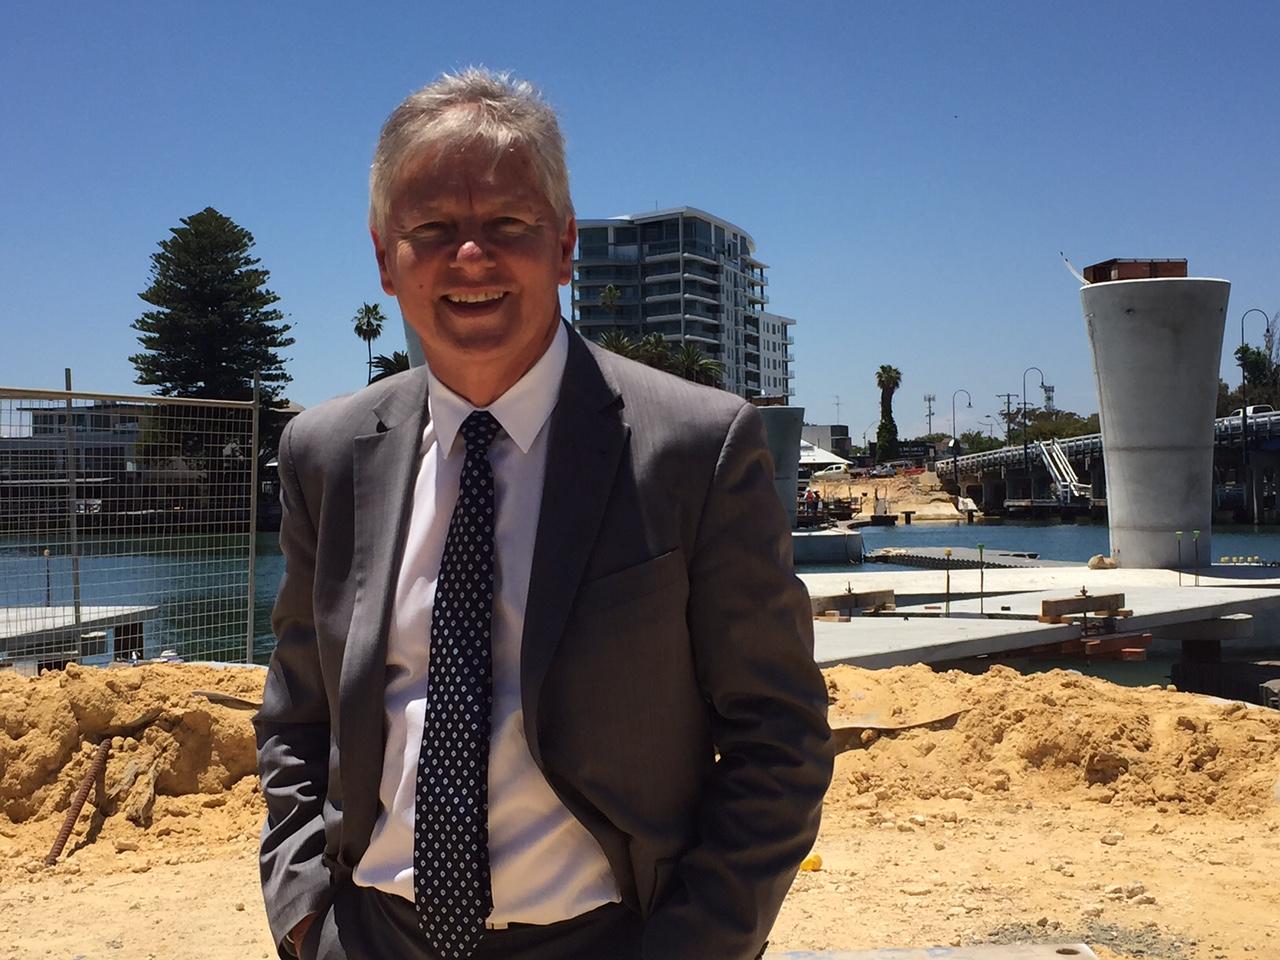 Transport Minister Bill Marmion viewed progress of the new Mandurah traffic bridge today.